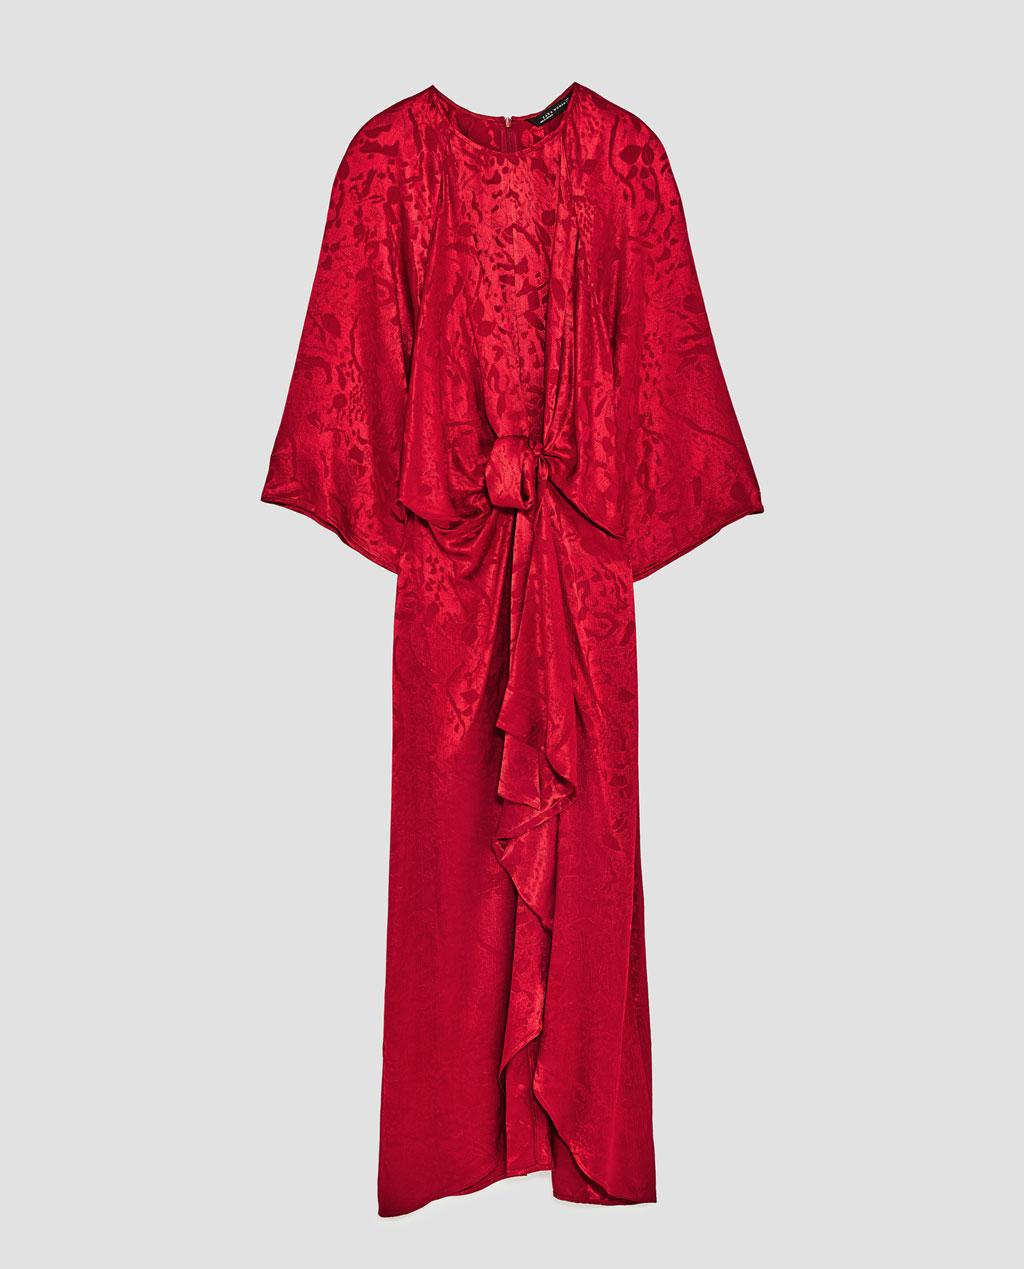 Printed Devore Maxi Dress, Zara